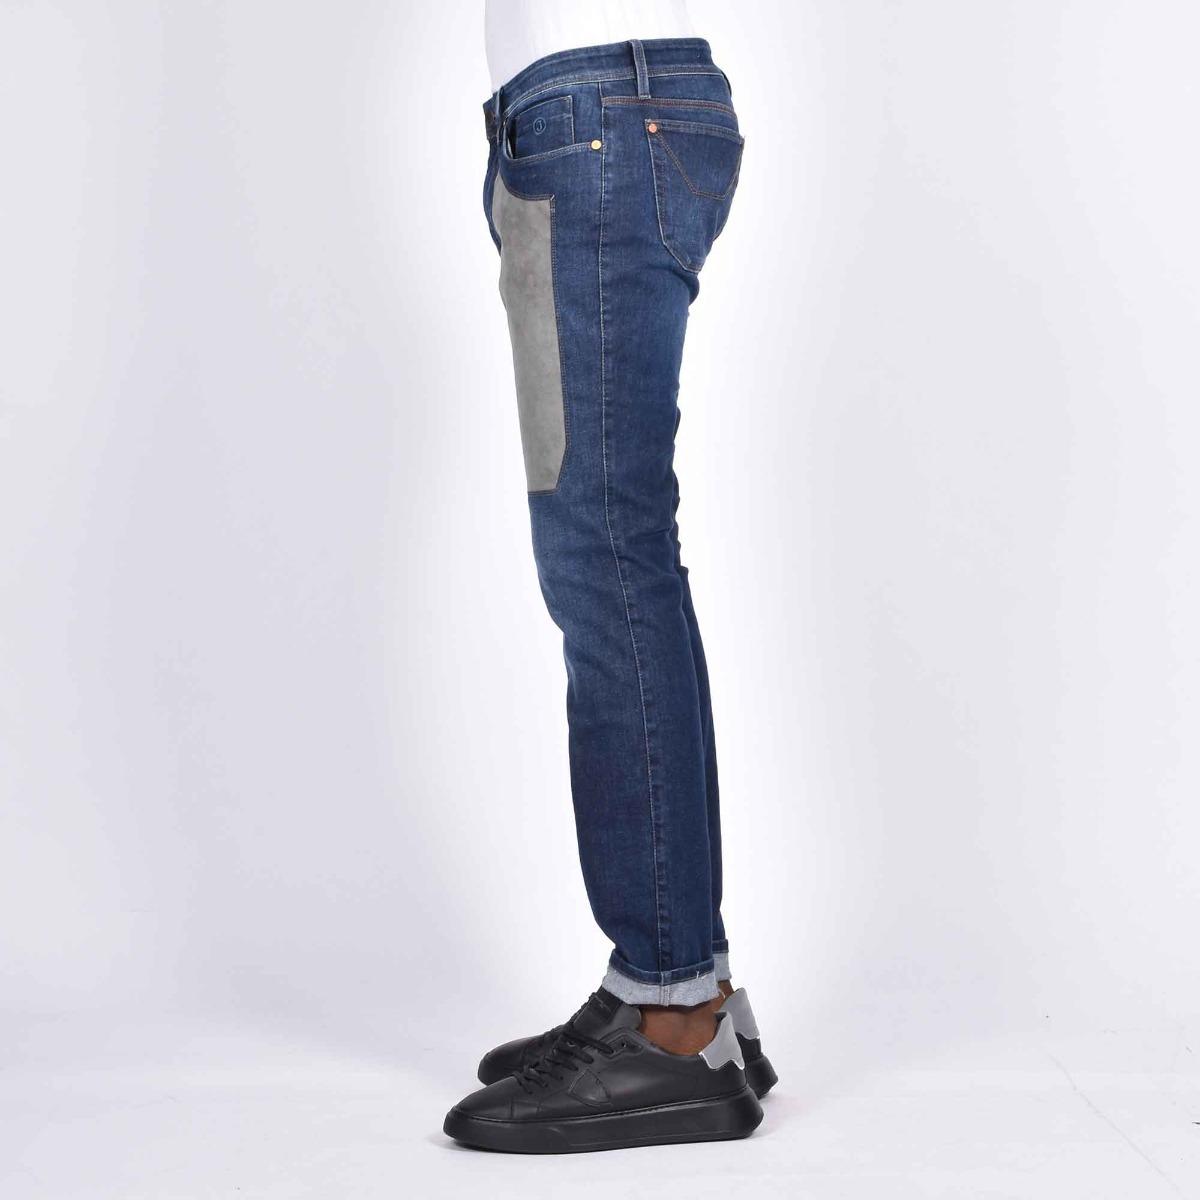 Jeans toppa alcantara grigio - Denim